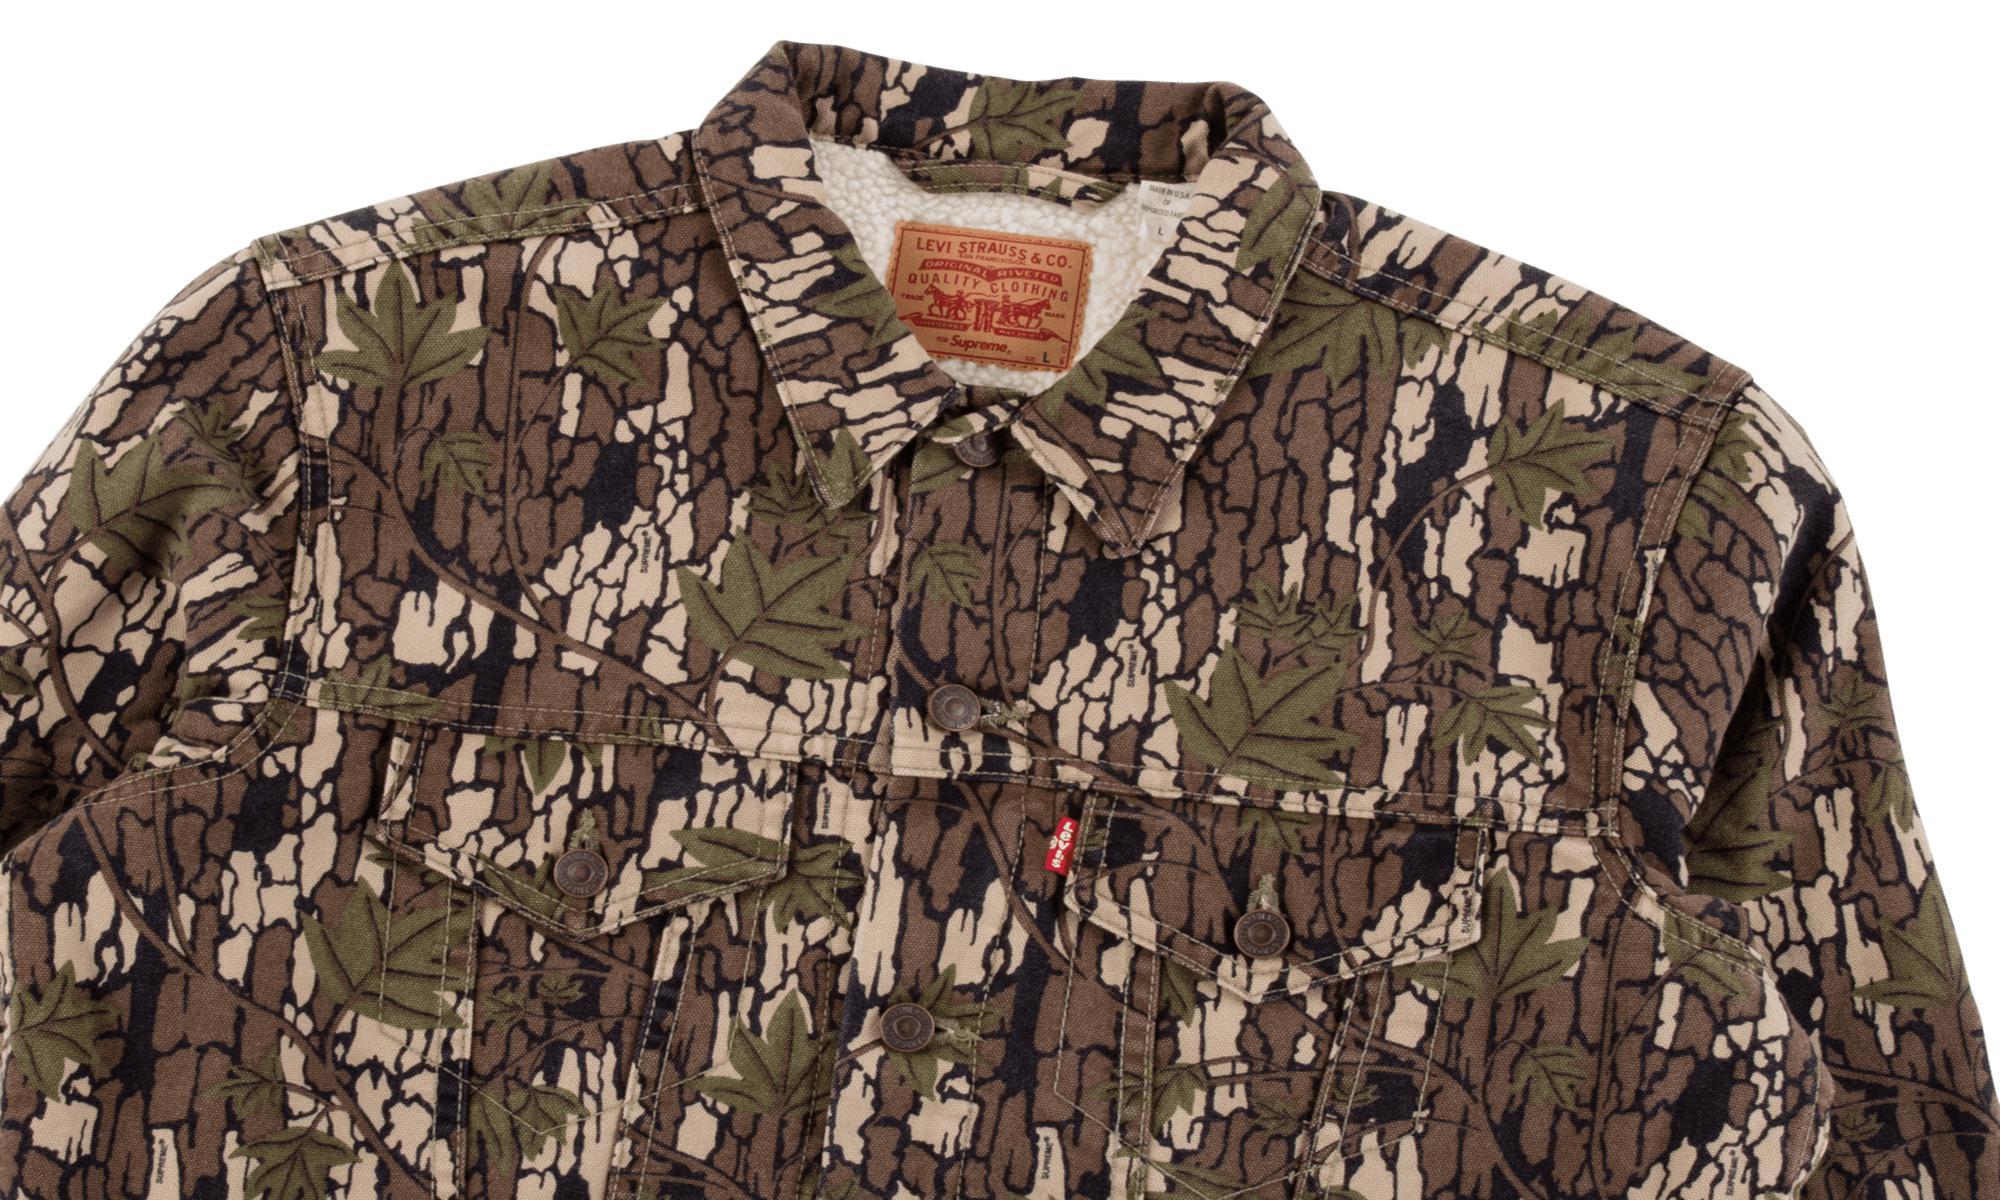 8a7e558db8 Lyst - Supreme Levi s Sherpa Jacket for Men